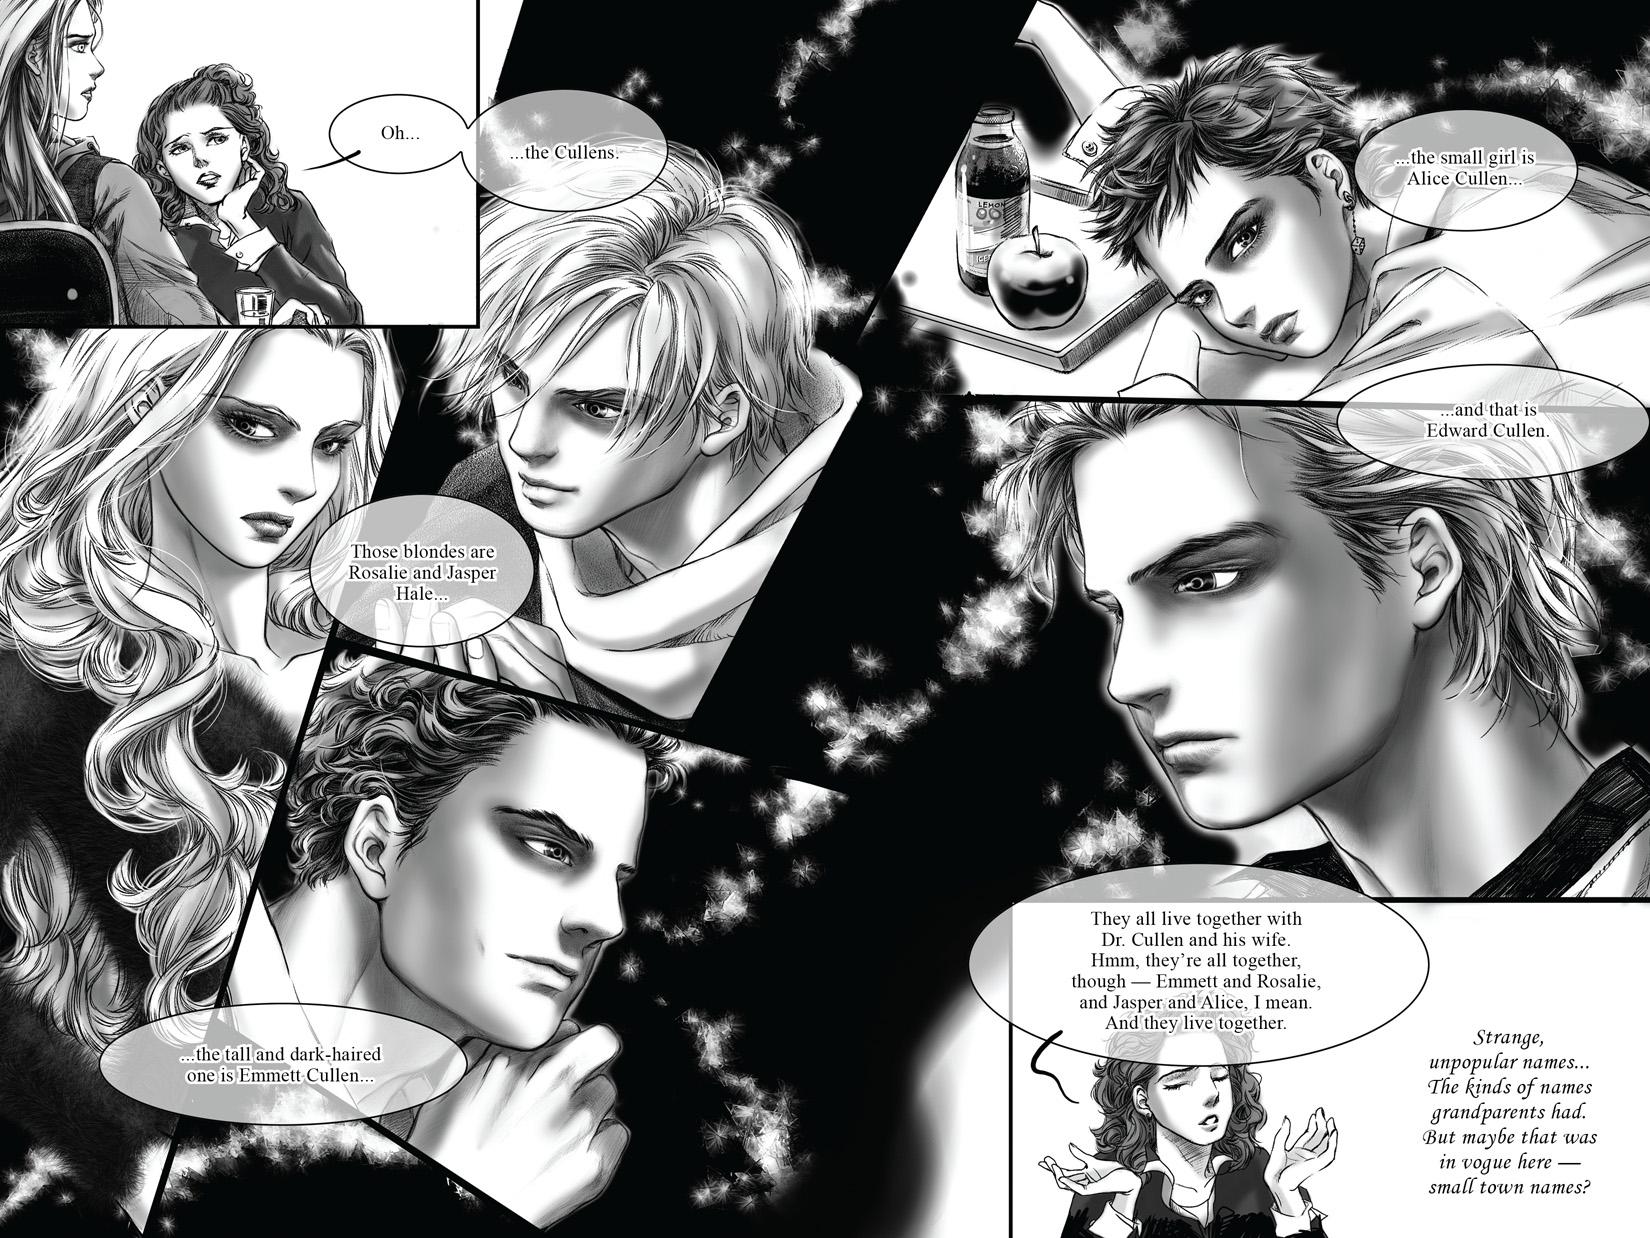 Amazon.com: Twilight: The Graphic Novel, Vol. 1 (The Twilight Saga